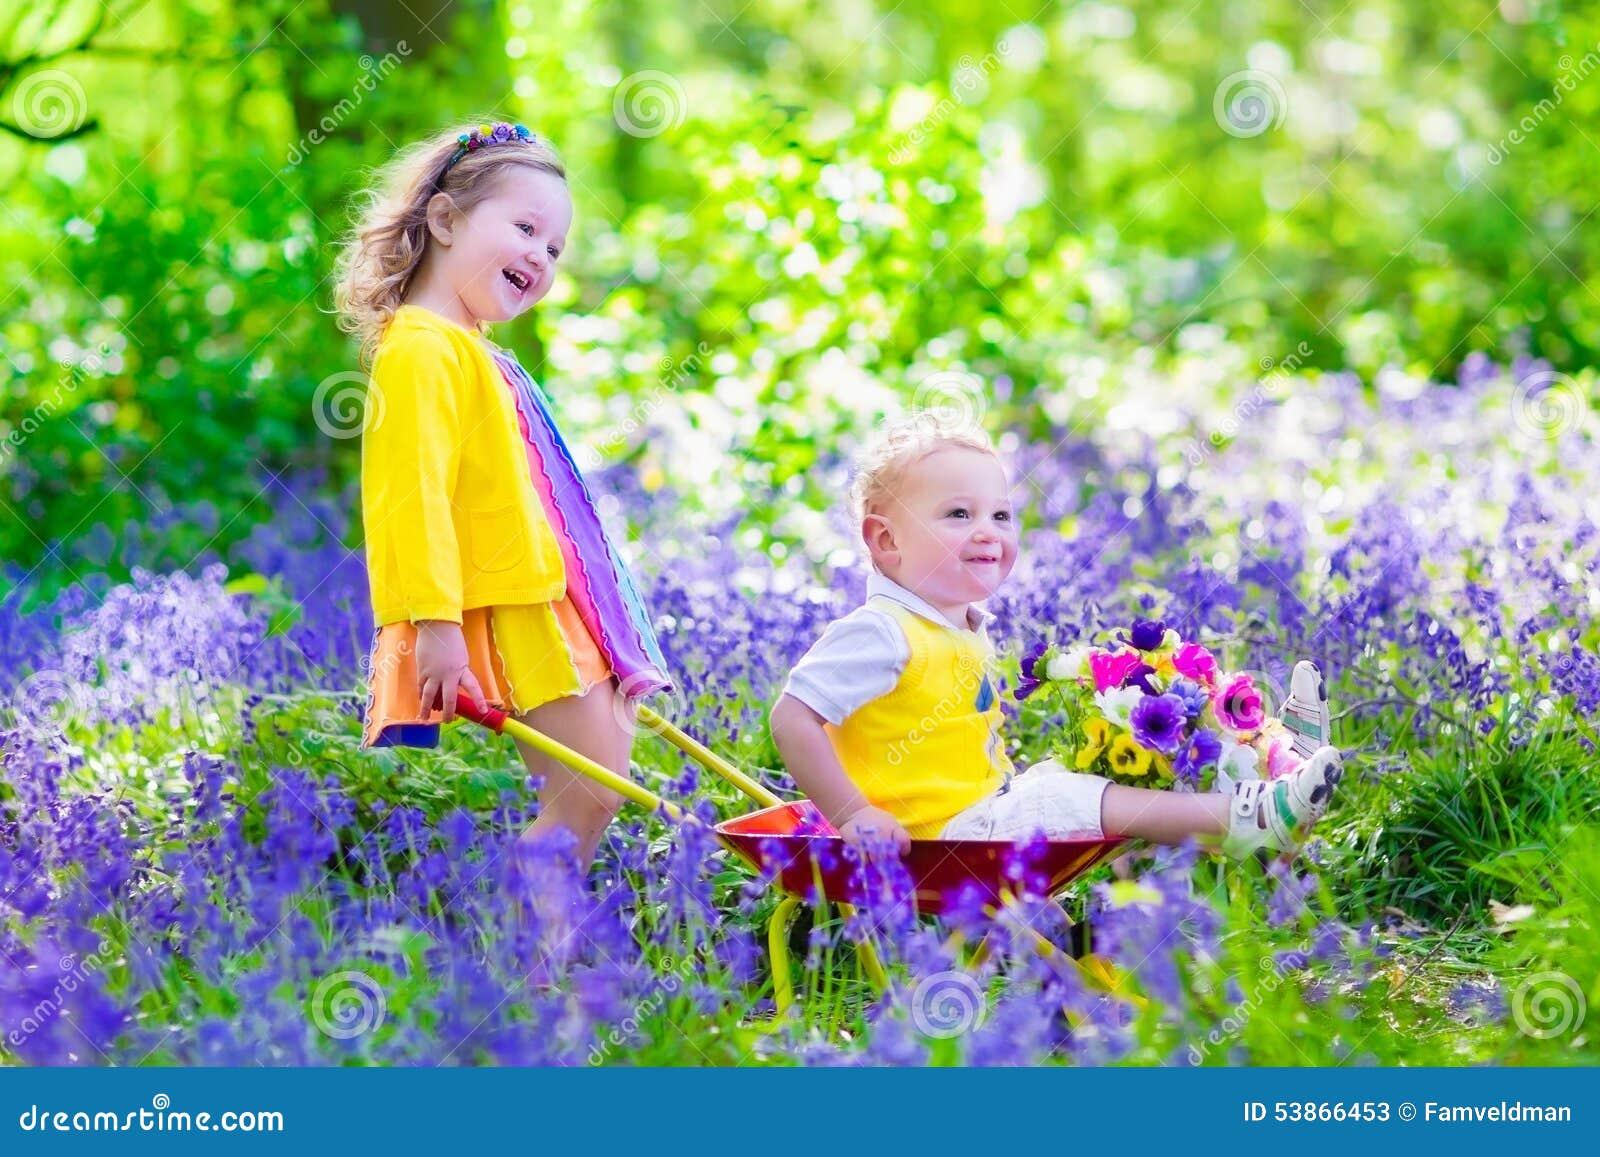 Garden planting flowers watering flower bed child pushing wheel